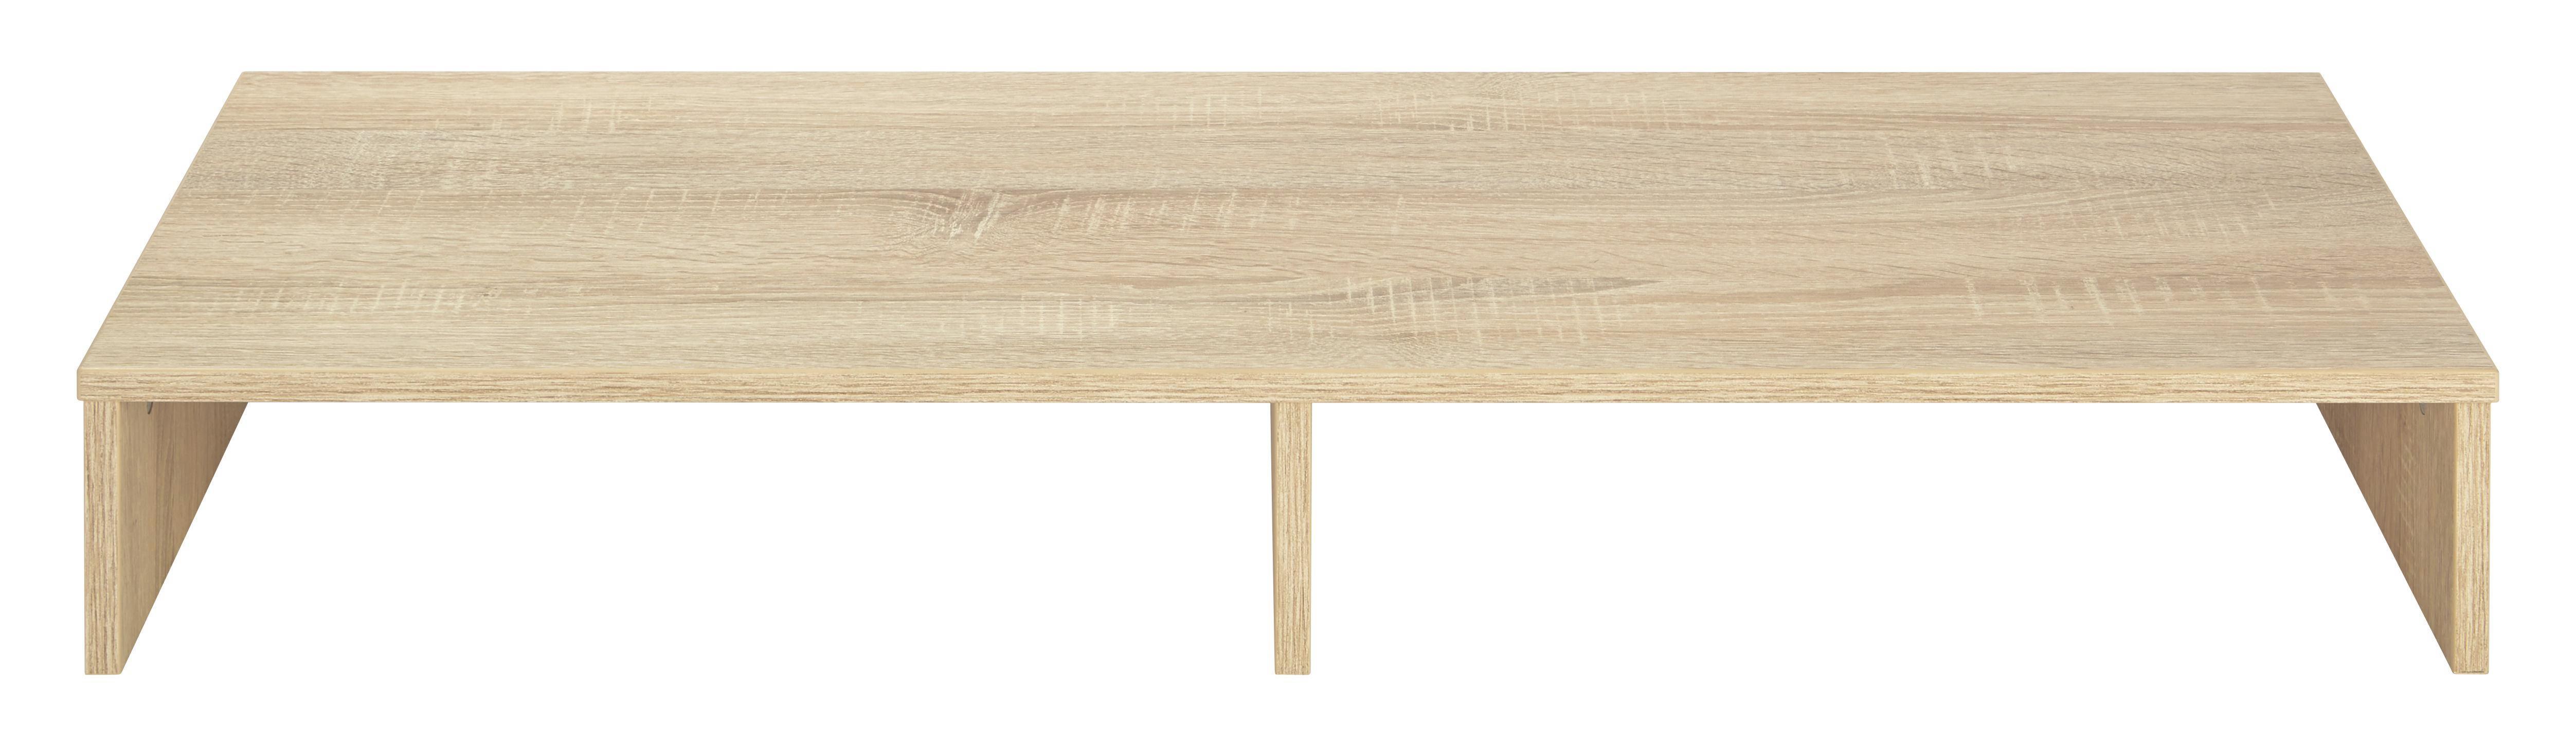 TV-Aufsatz Holz - Eichefarben, Holz (99/14/34cm) - MÖMAX modern living